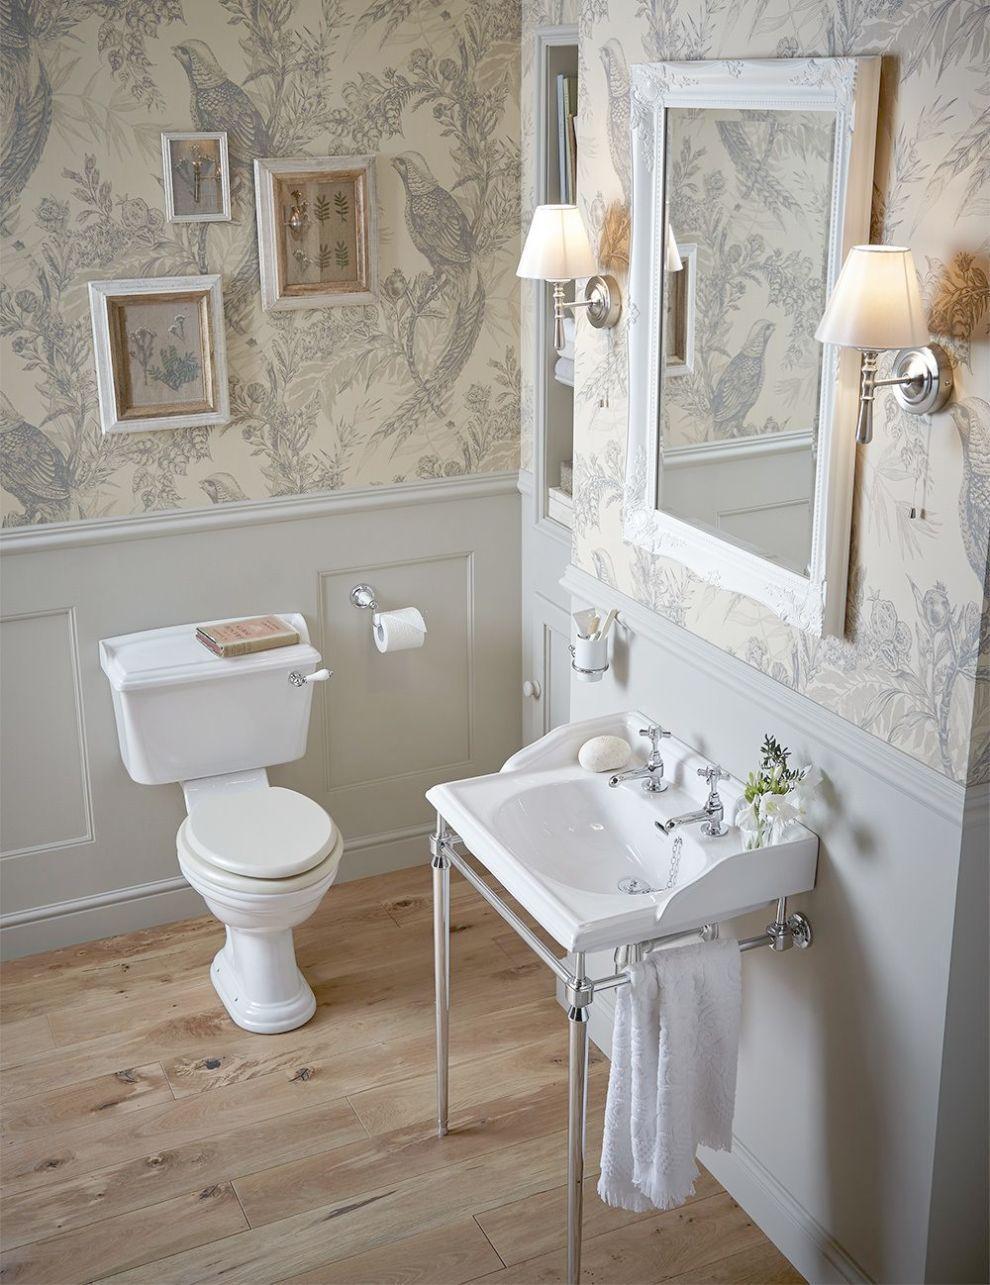 Oneisall S001a Luxury Bathroom Accessories Toilet Brush Holder Set